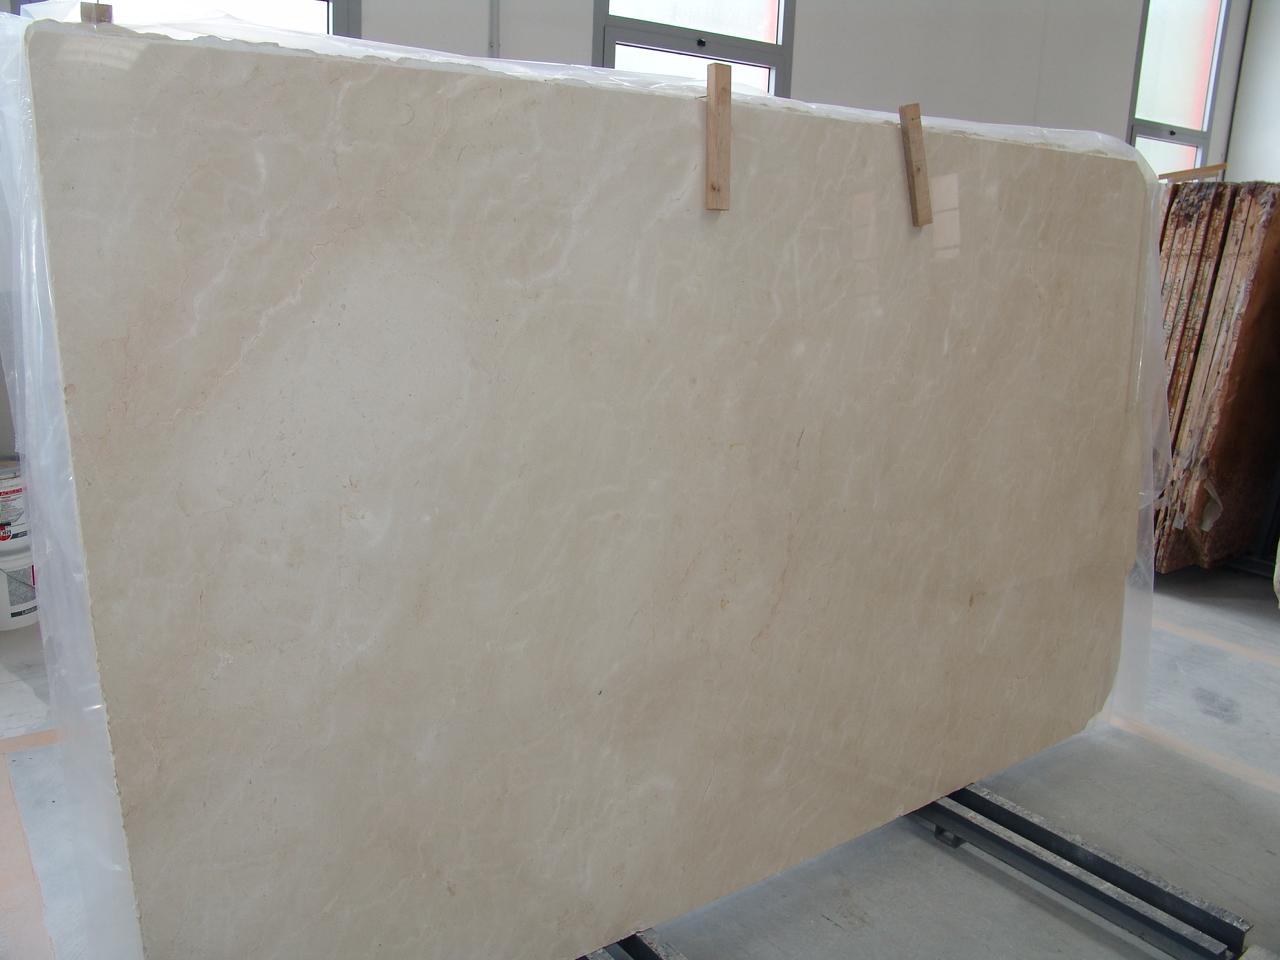 Crema Marfil C Picture #62473C 1280x960 Bancada Banheiro Crema Marfil